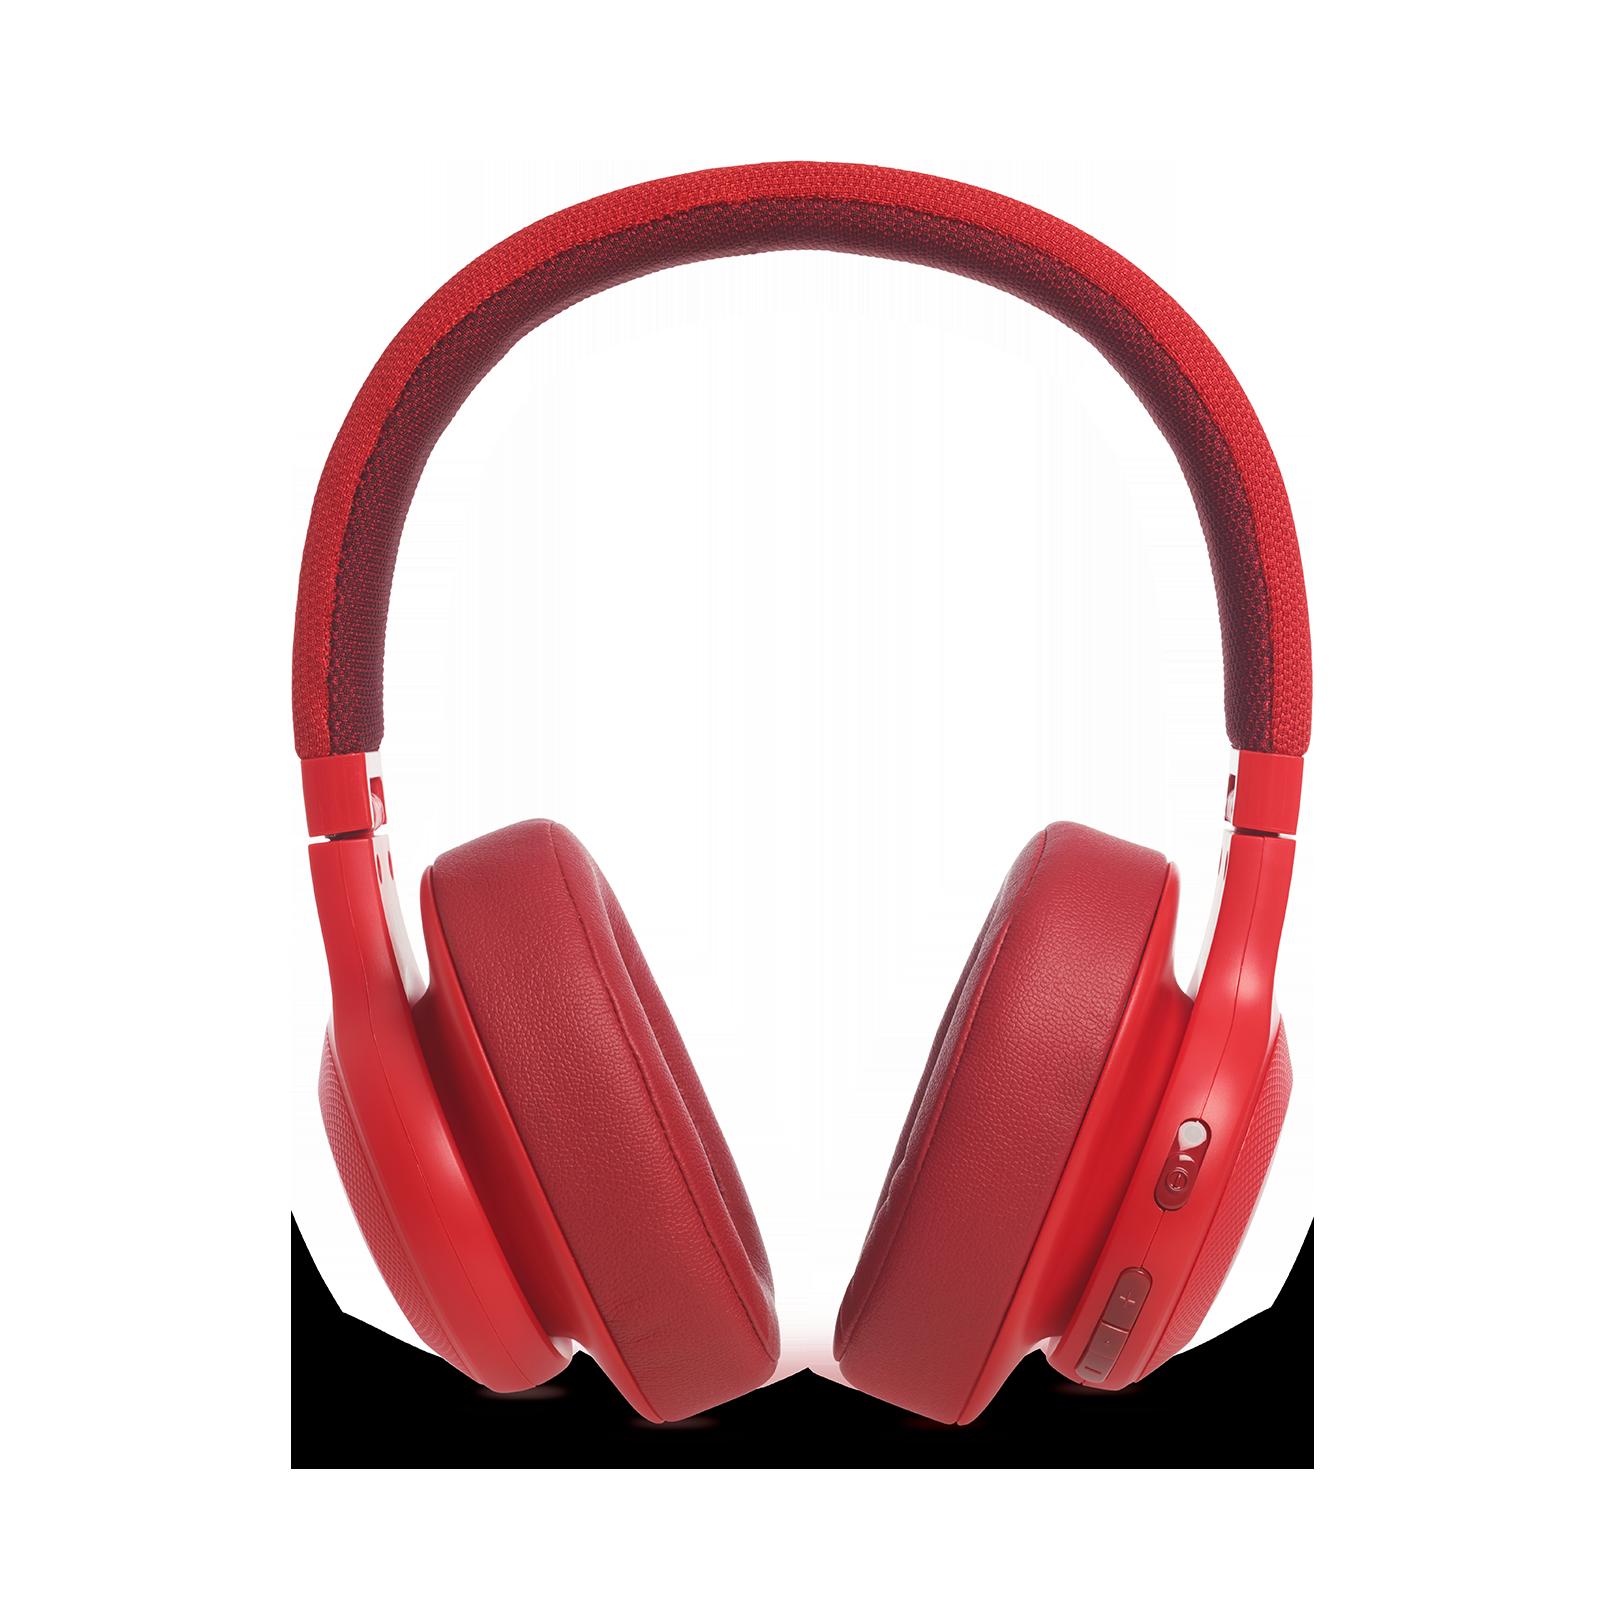 JBL E55BT - Red - Wireless over-ear headphones - Detailshot 4